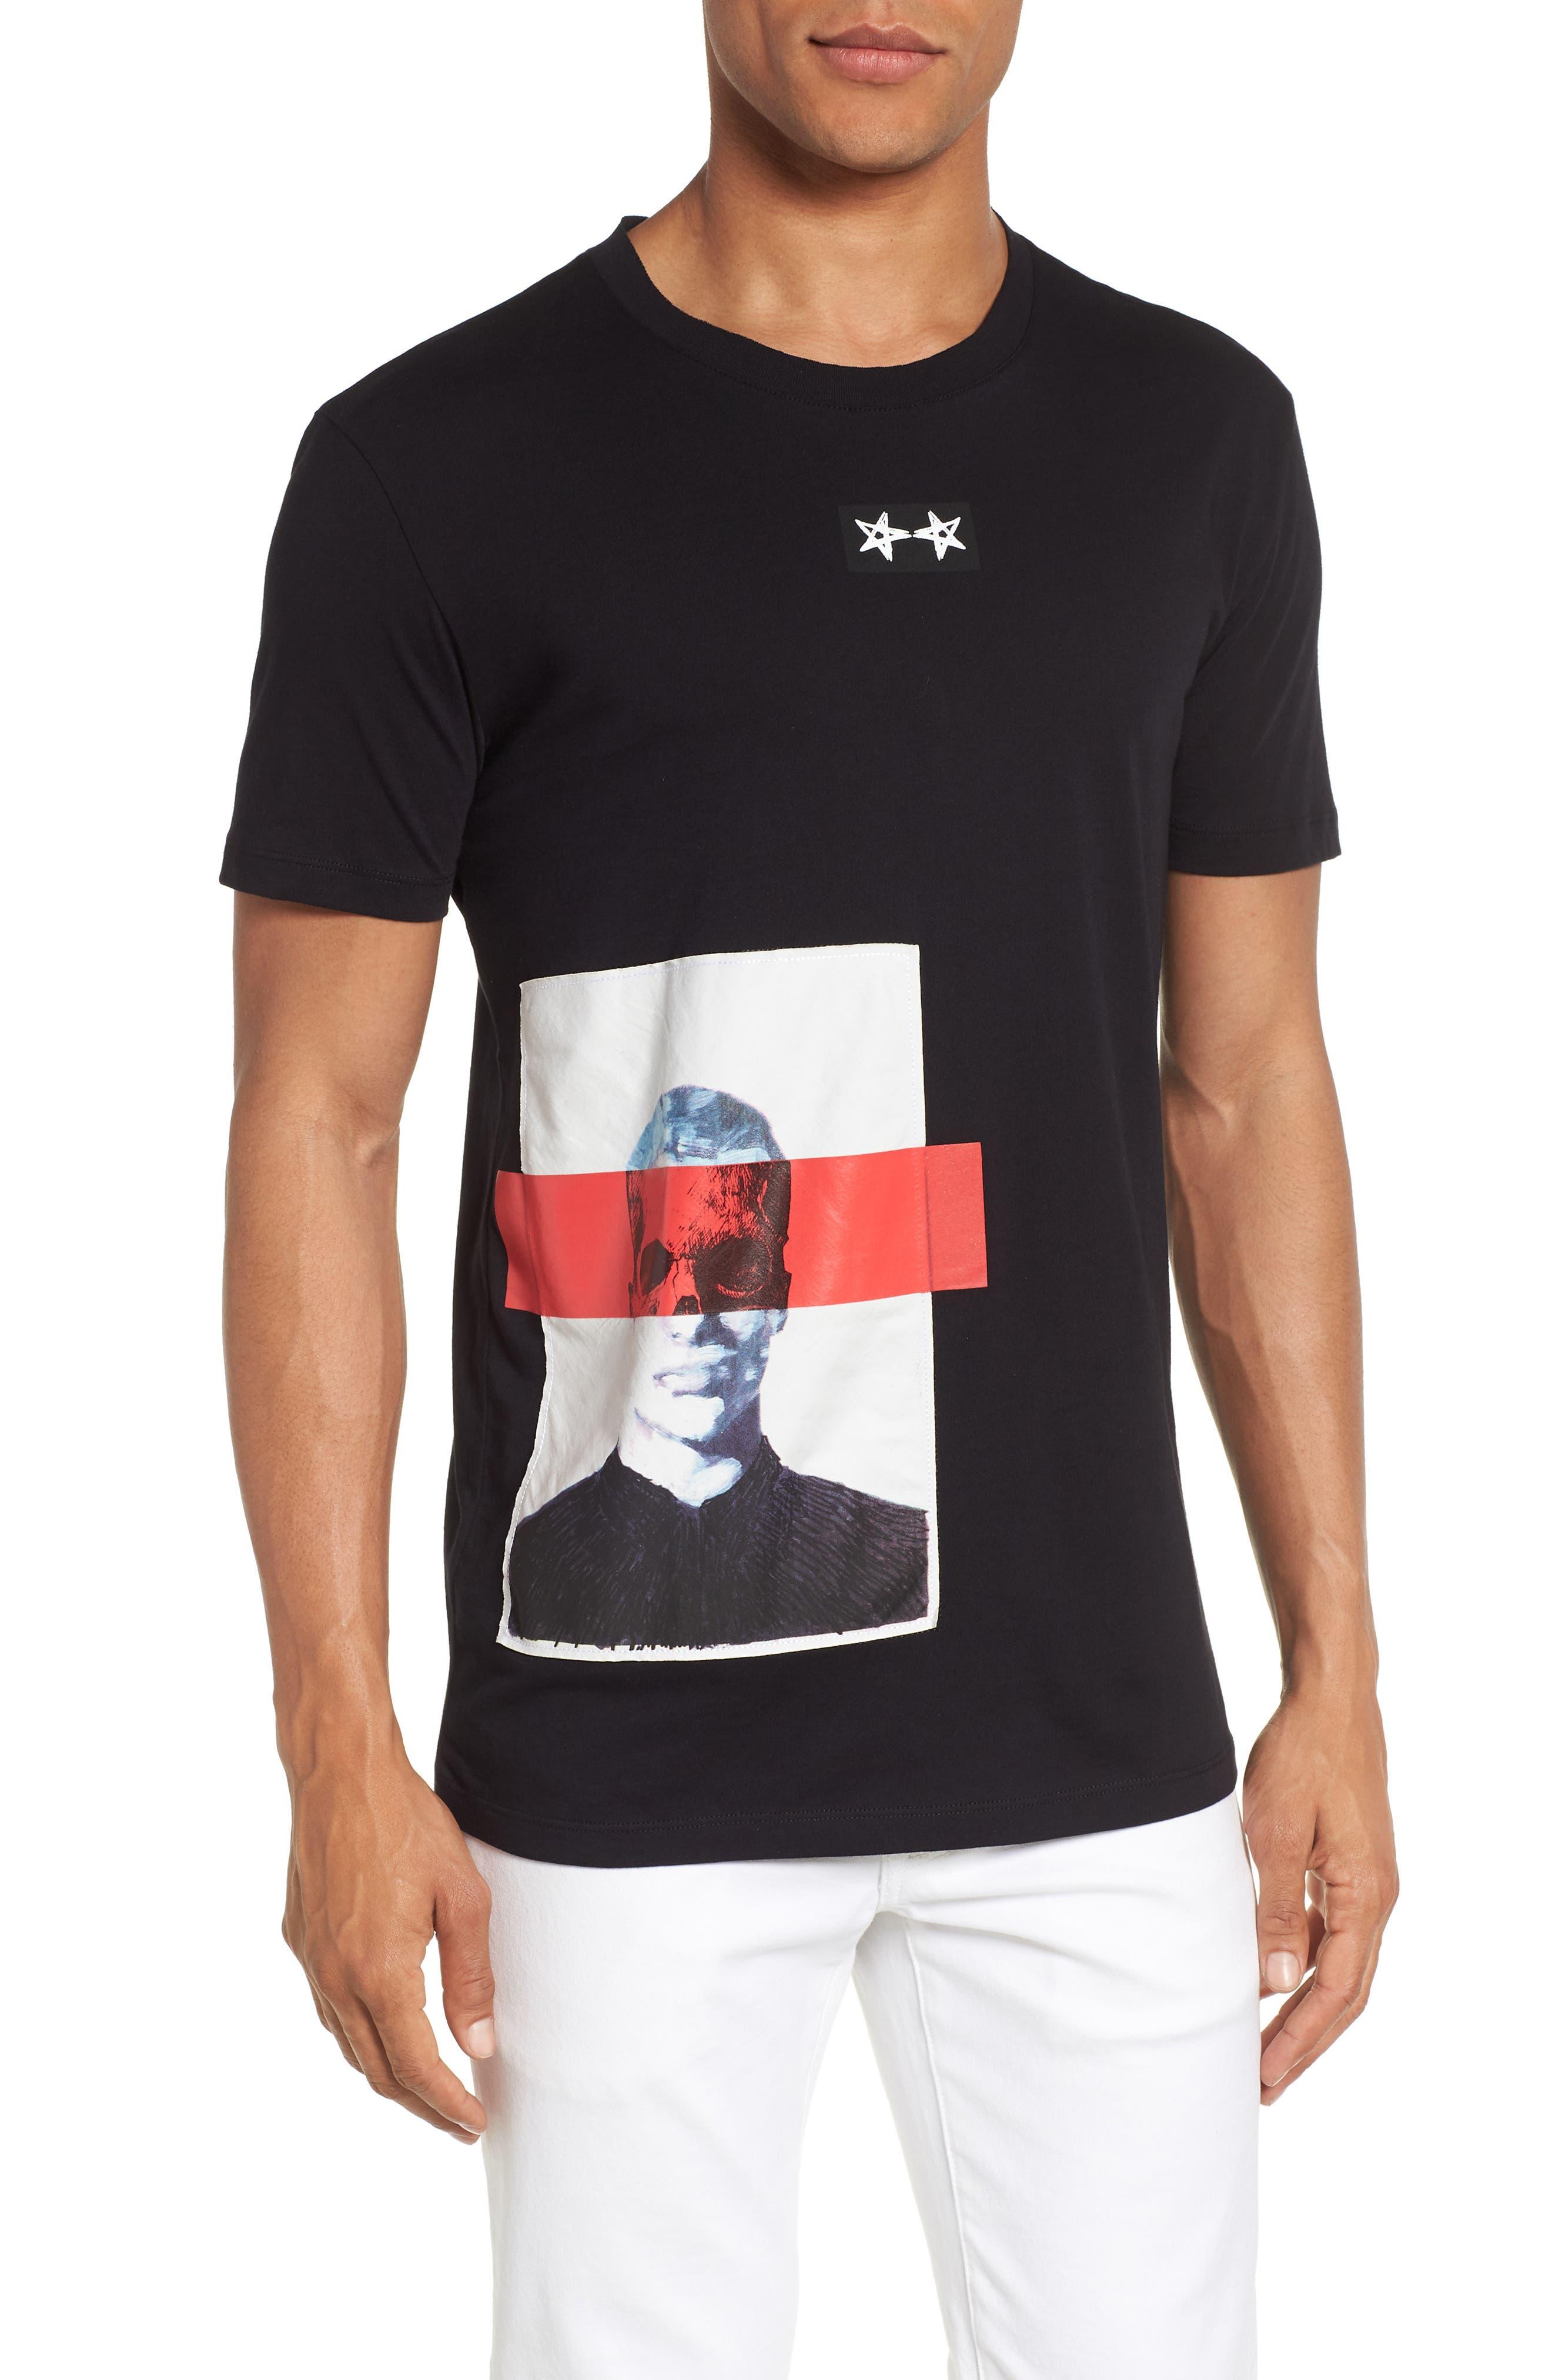 Dimage T-Shirt,                             Main thumbnail 1, color,                             Black